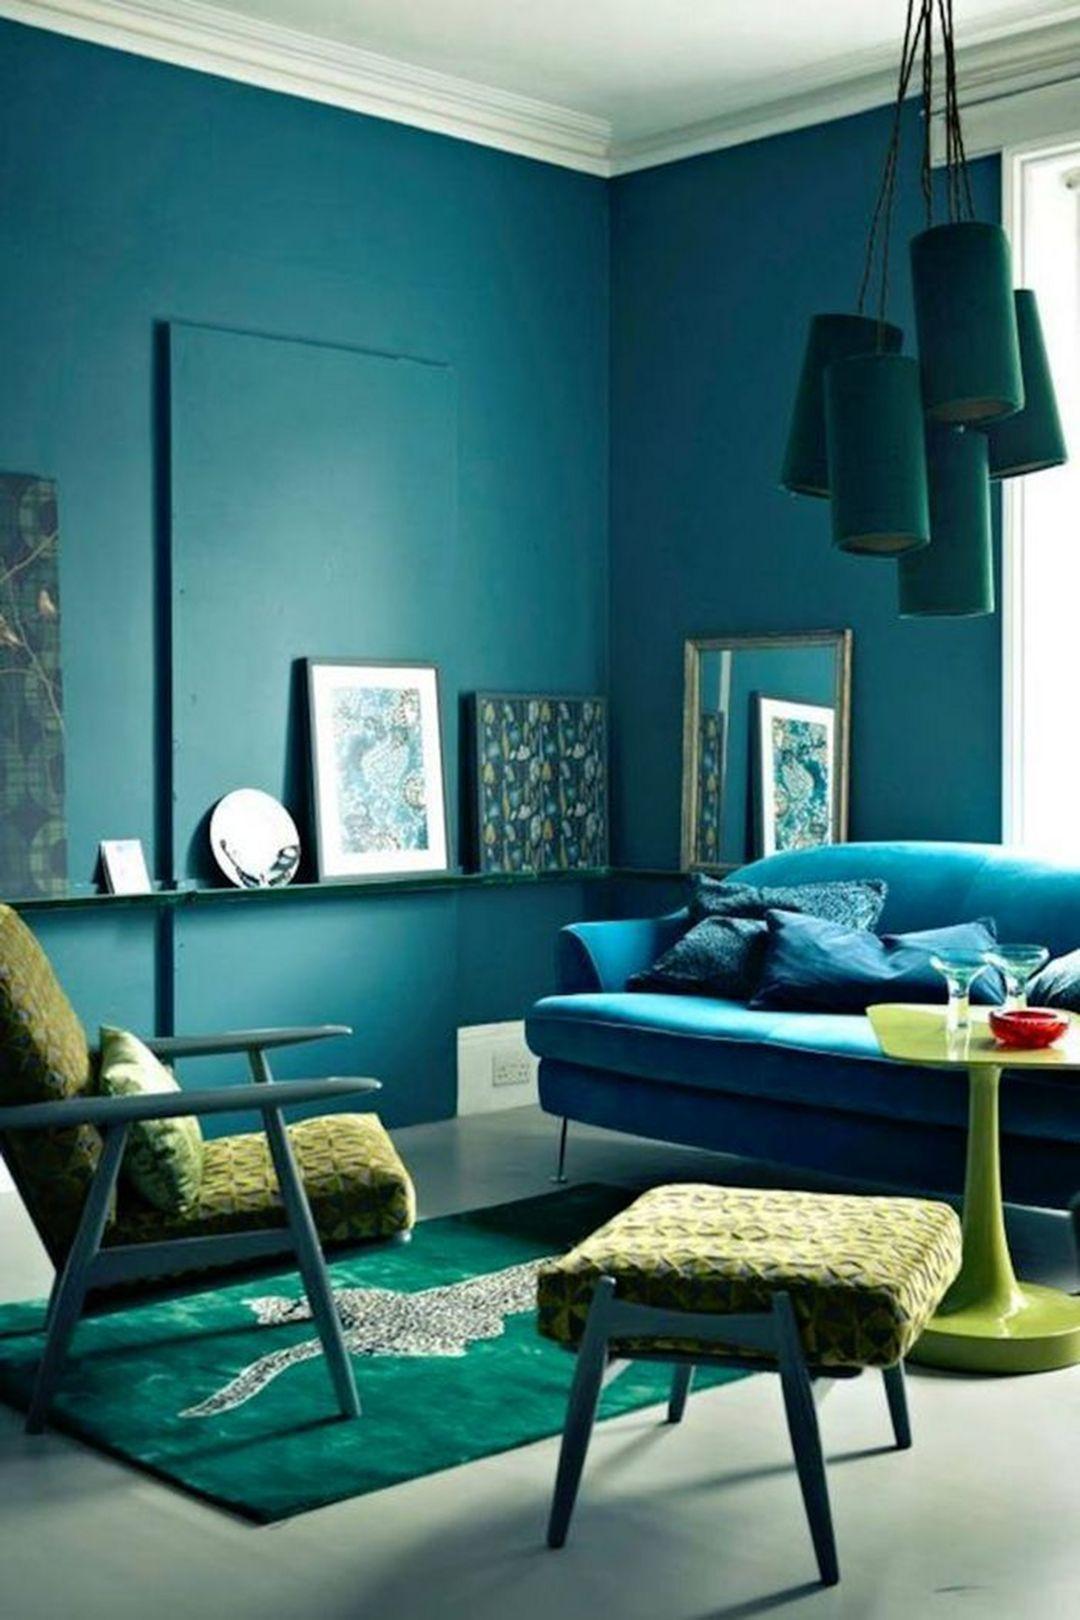 Beautiful Color Harmony Interior Design Ideas 110 Turquoise Room